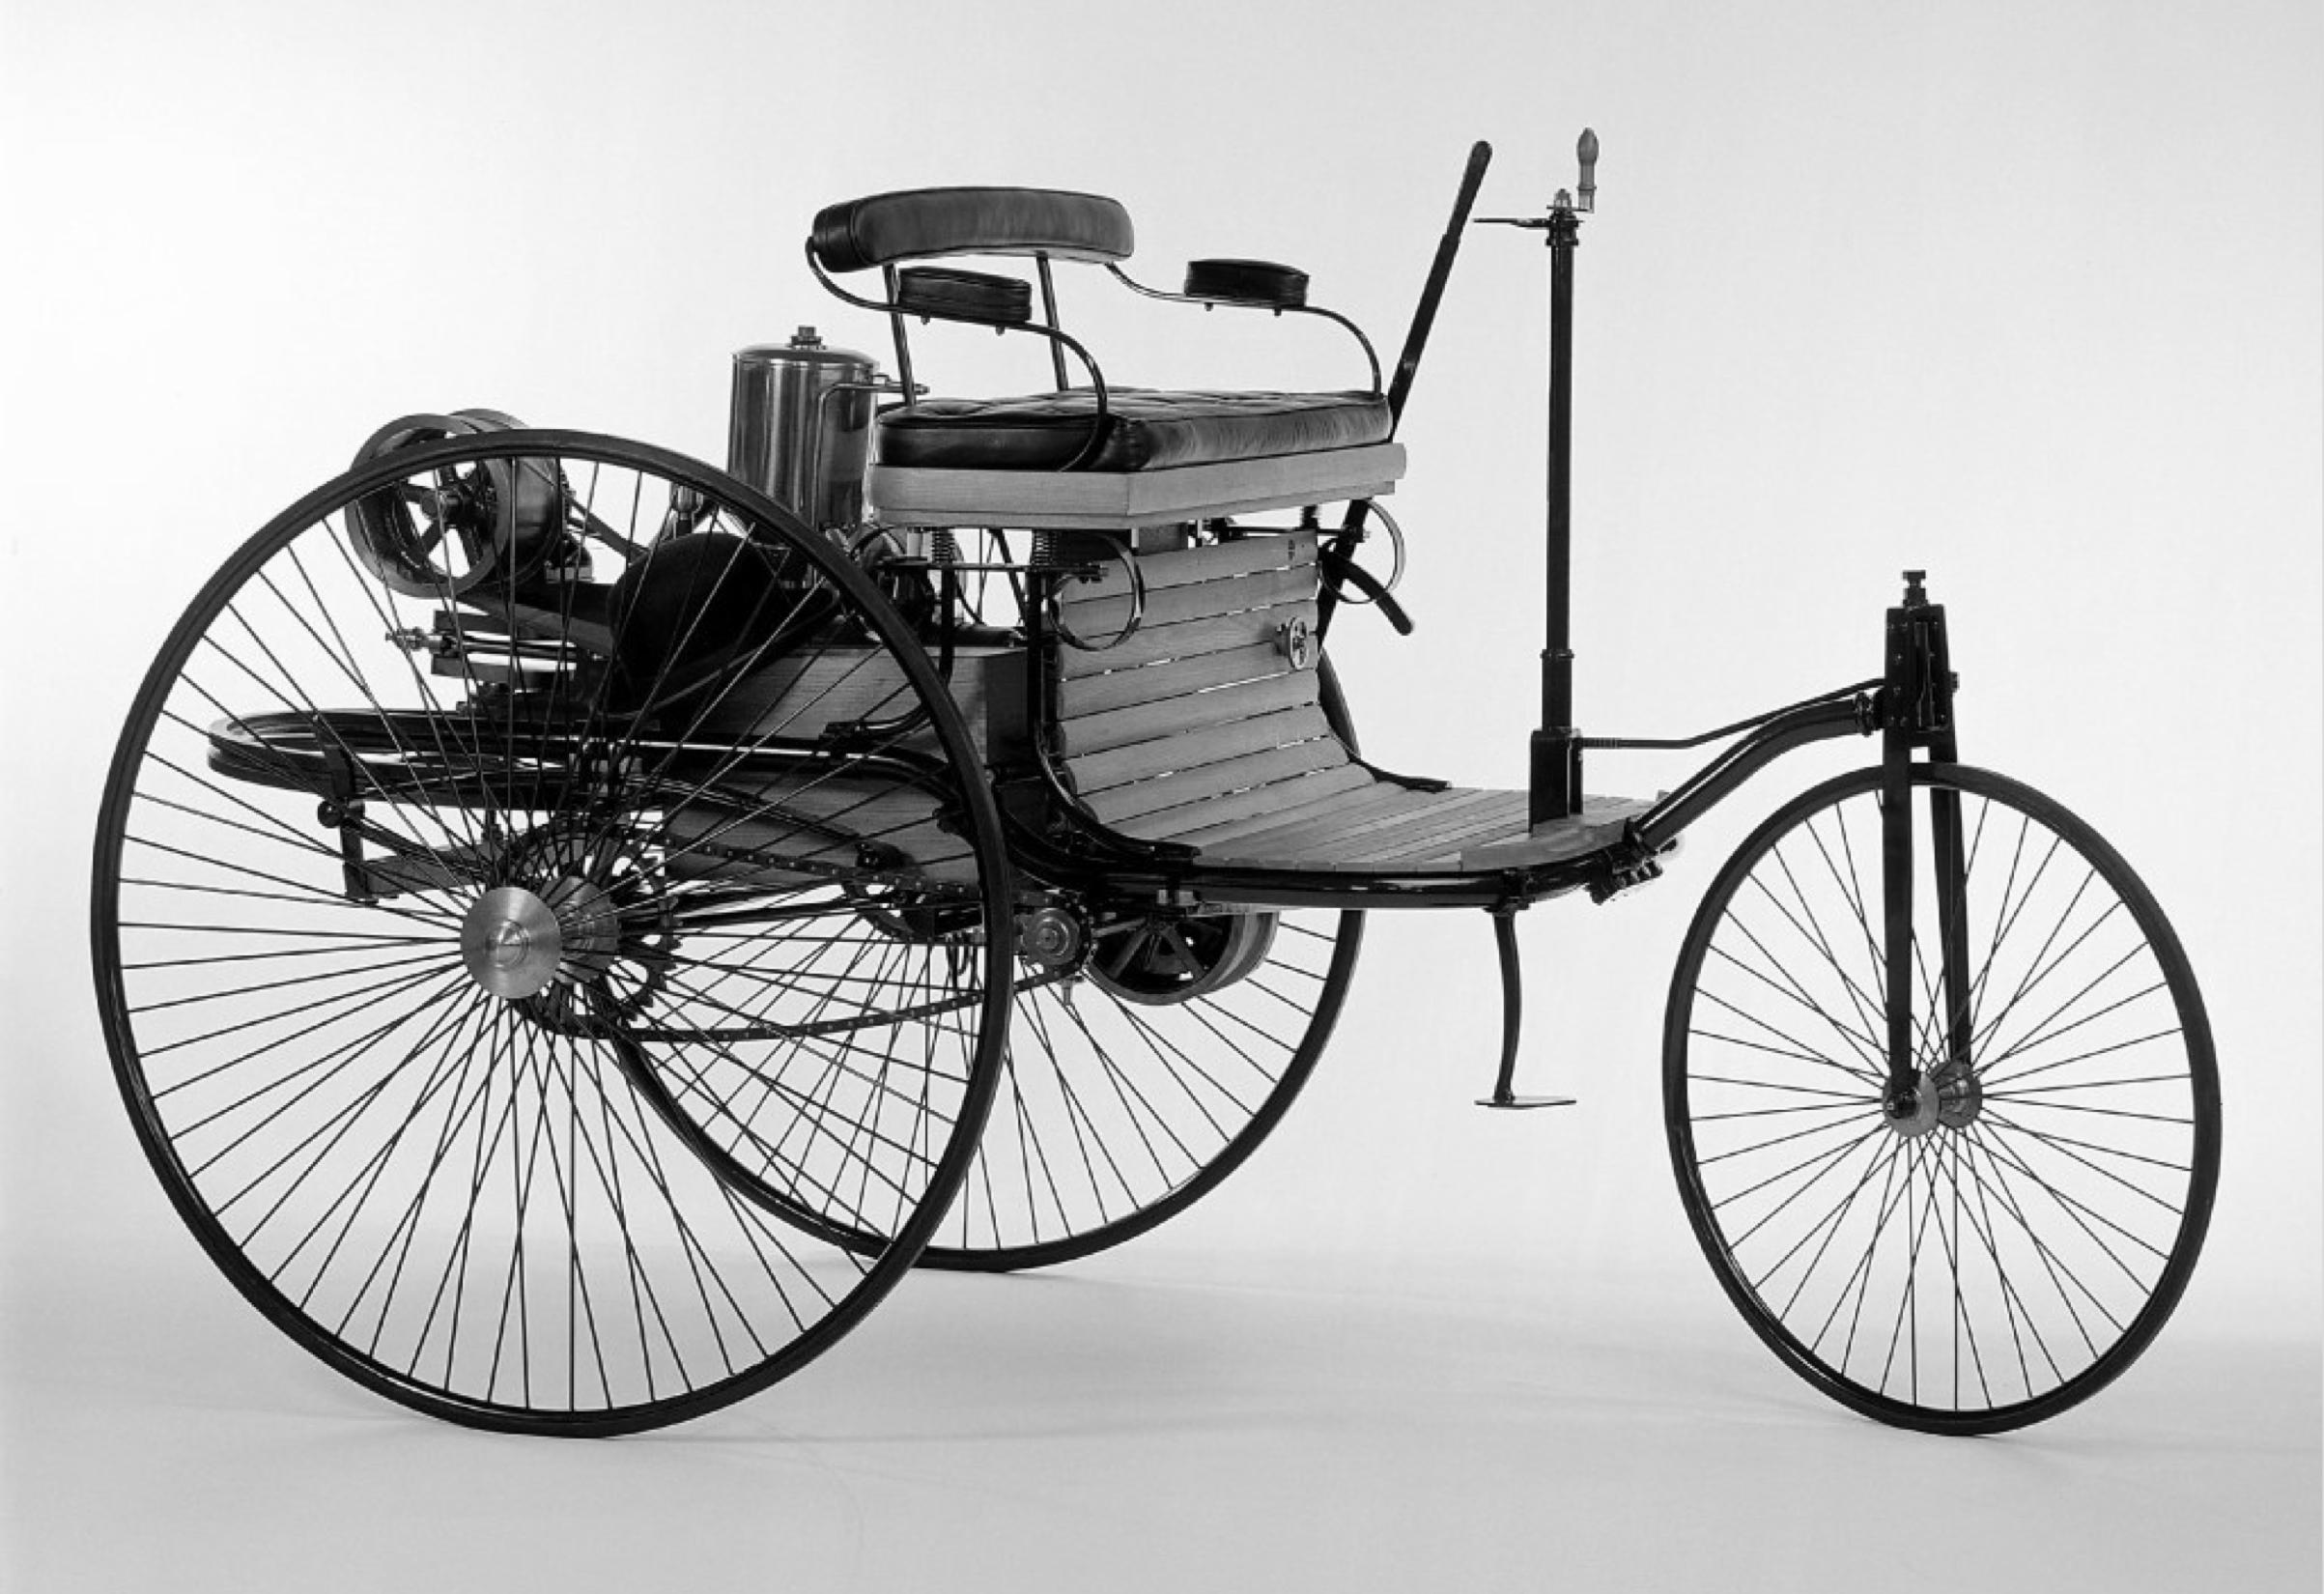 benz-patent-motorwagen-w1024xh512-cutout